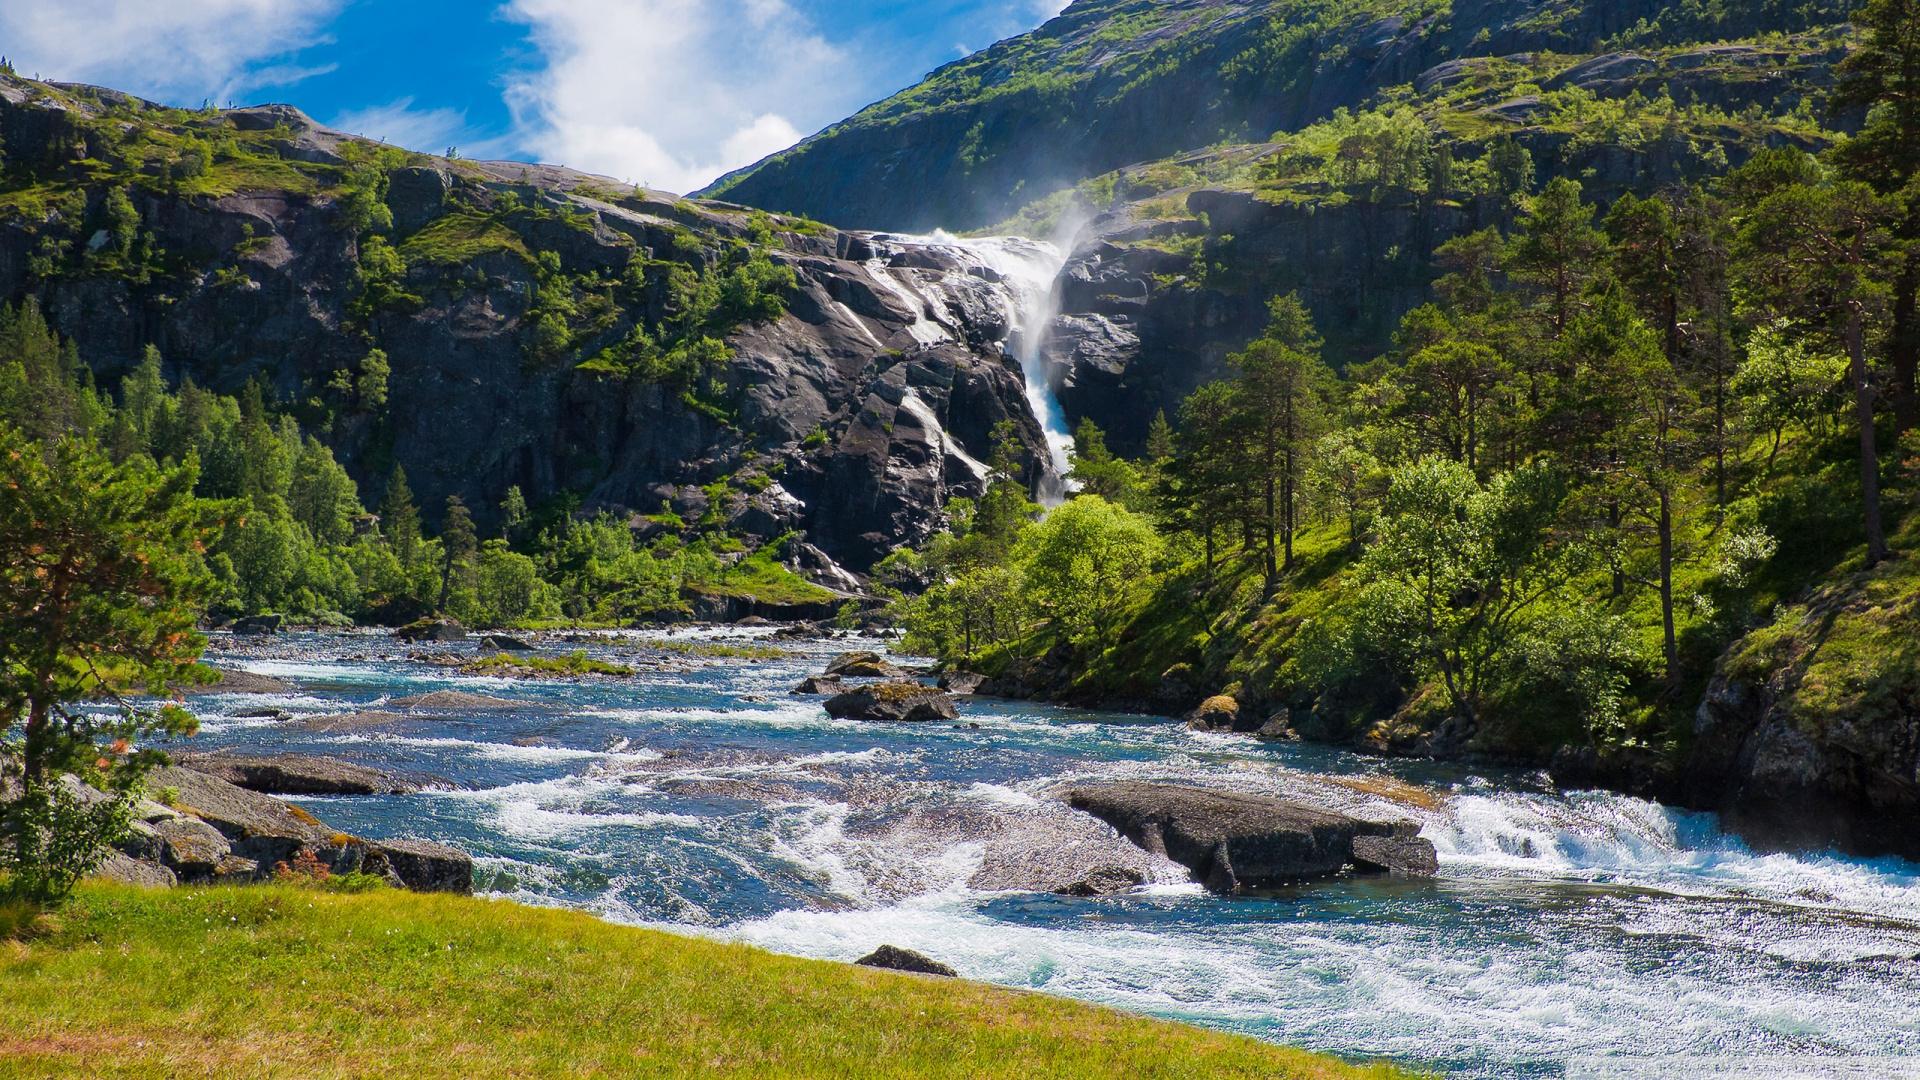 colon-net riviere cascade efficace